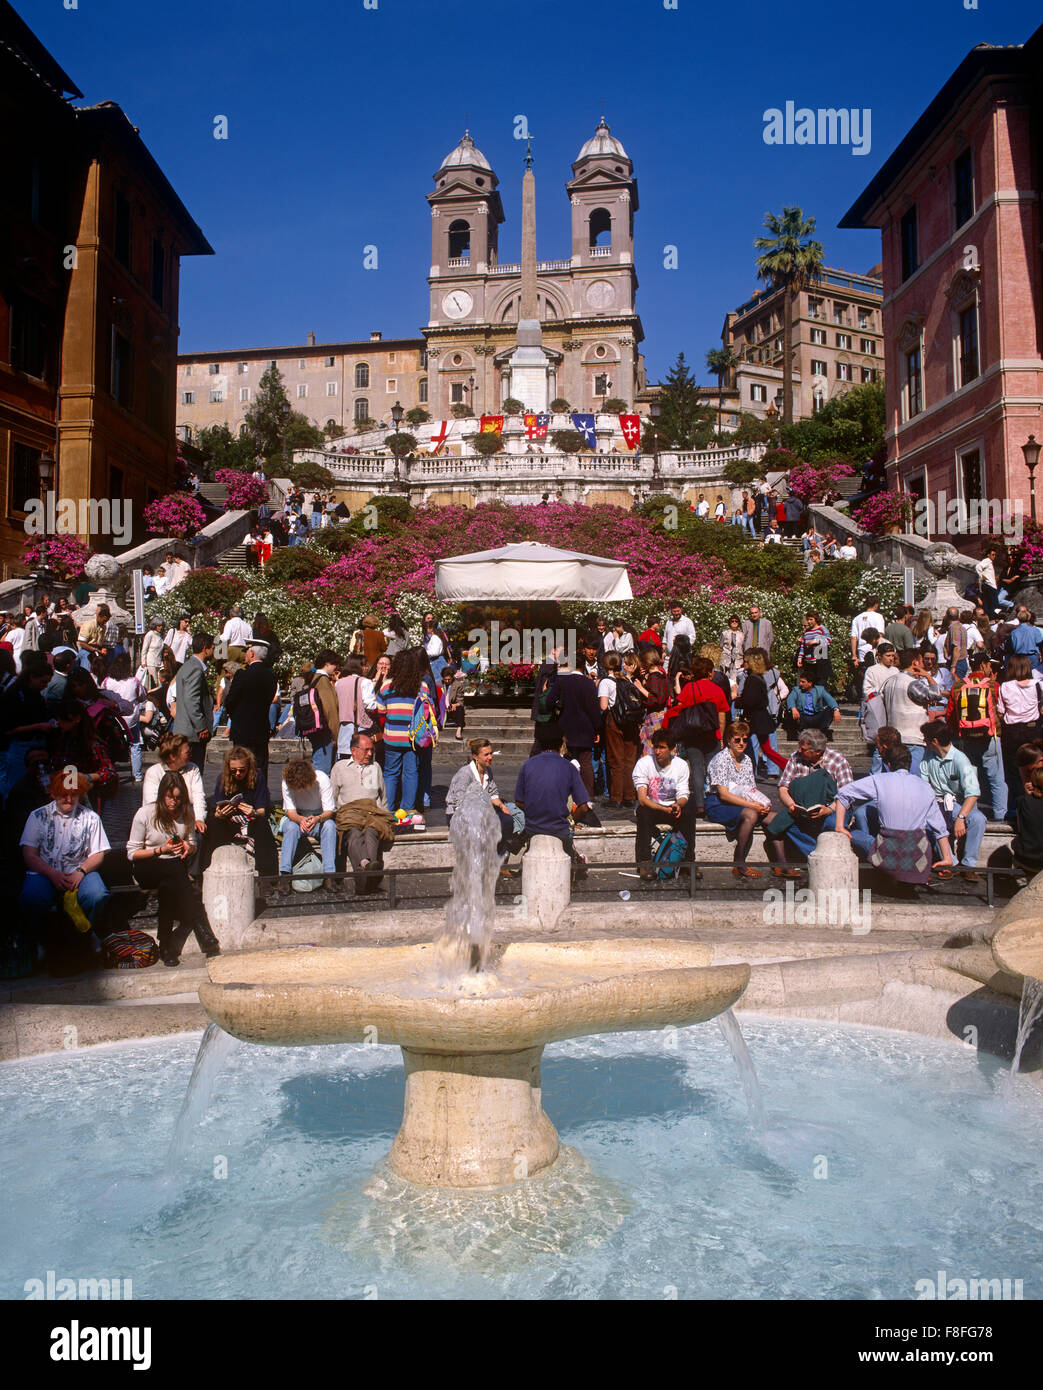 Spanish Steps, Rome, Lazio, Italy - Stock Image